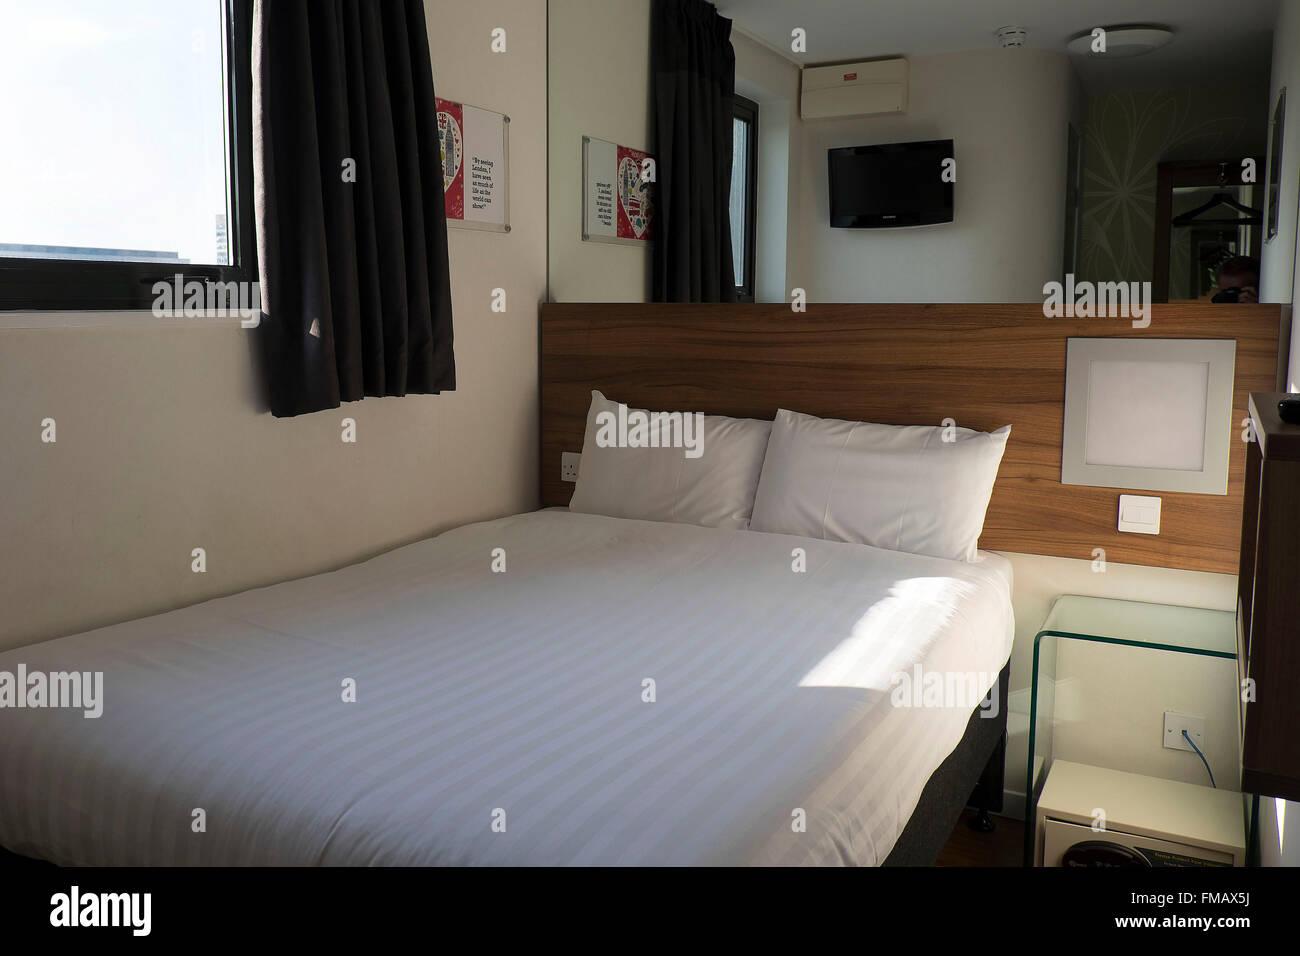 Tune Hotel Stock Photos & Tune Hotel Stock Images - Alamy